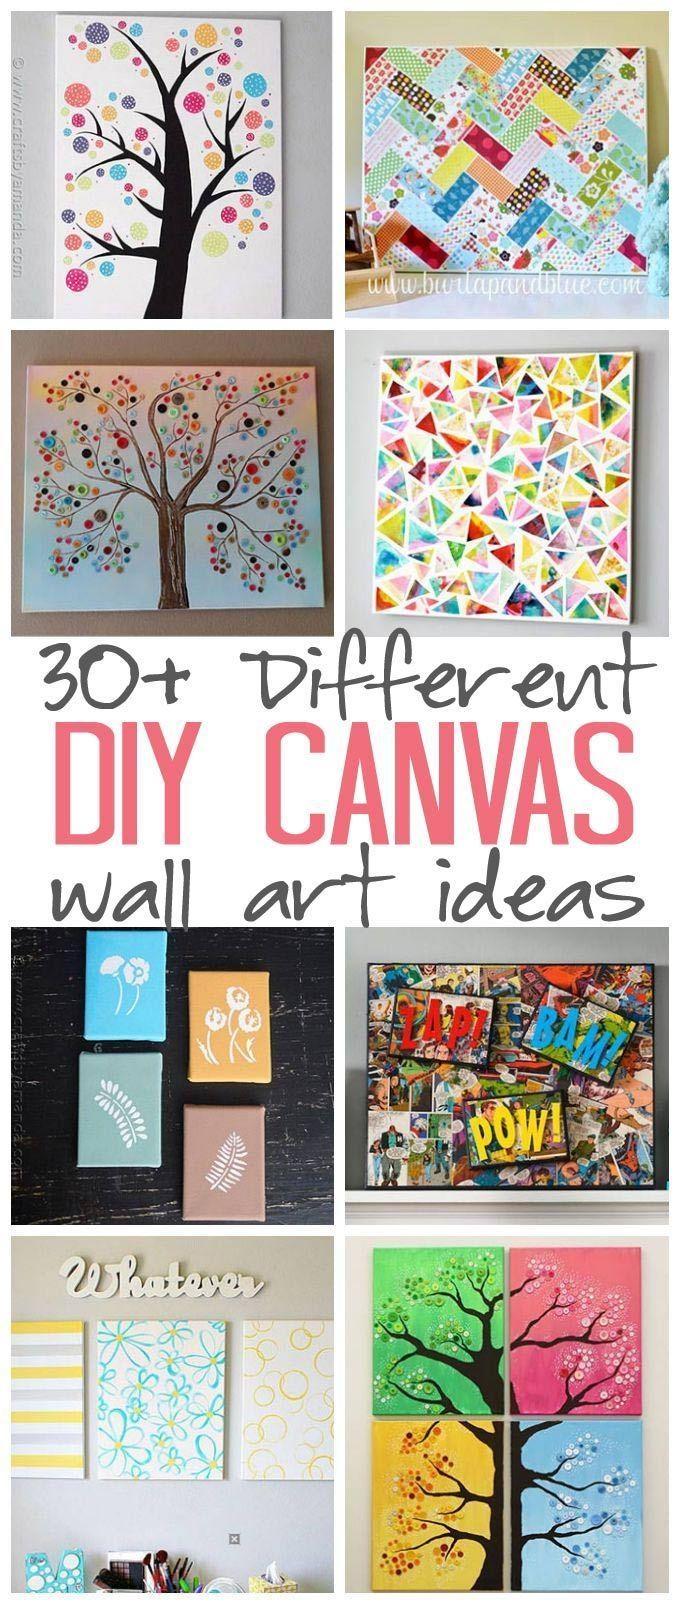 105 Best Art For Me Images On Pinterest | Diy, Drawings And Kid Inside Diy Pinterest Canvas Art (Image 1 of 20)